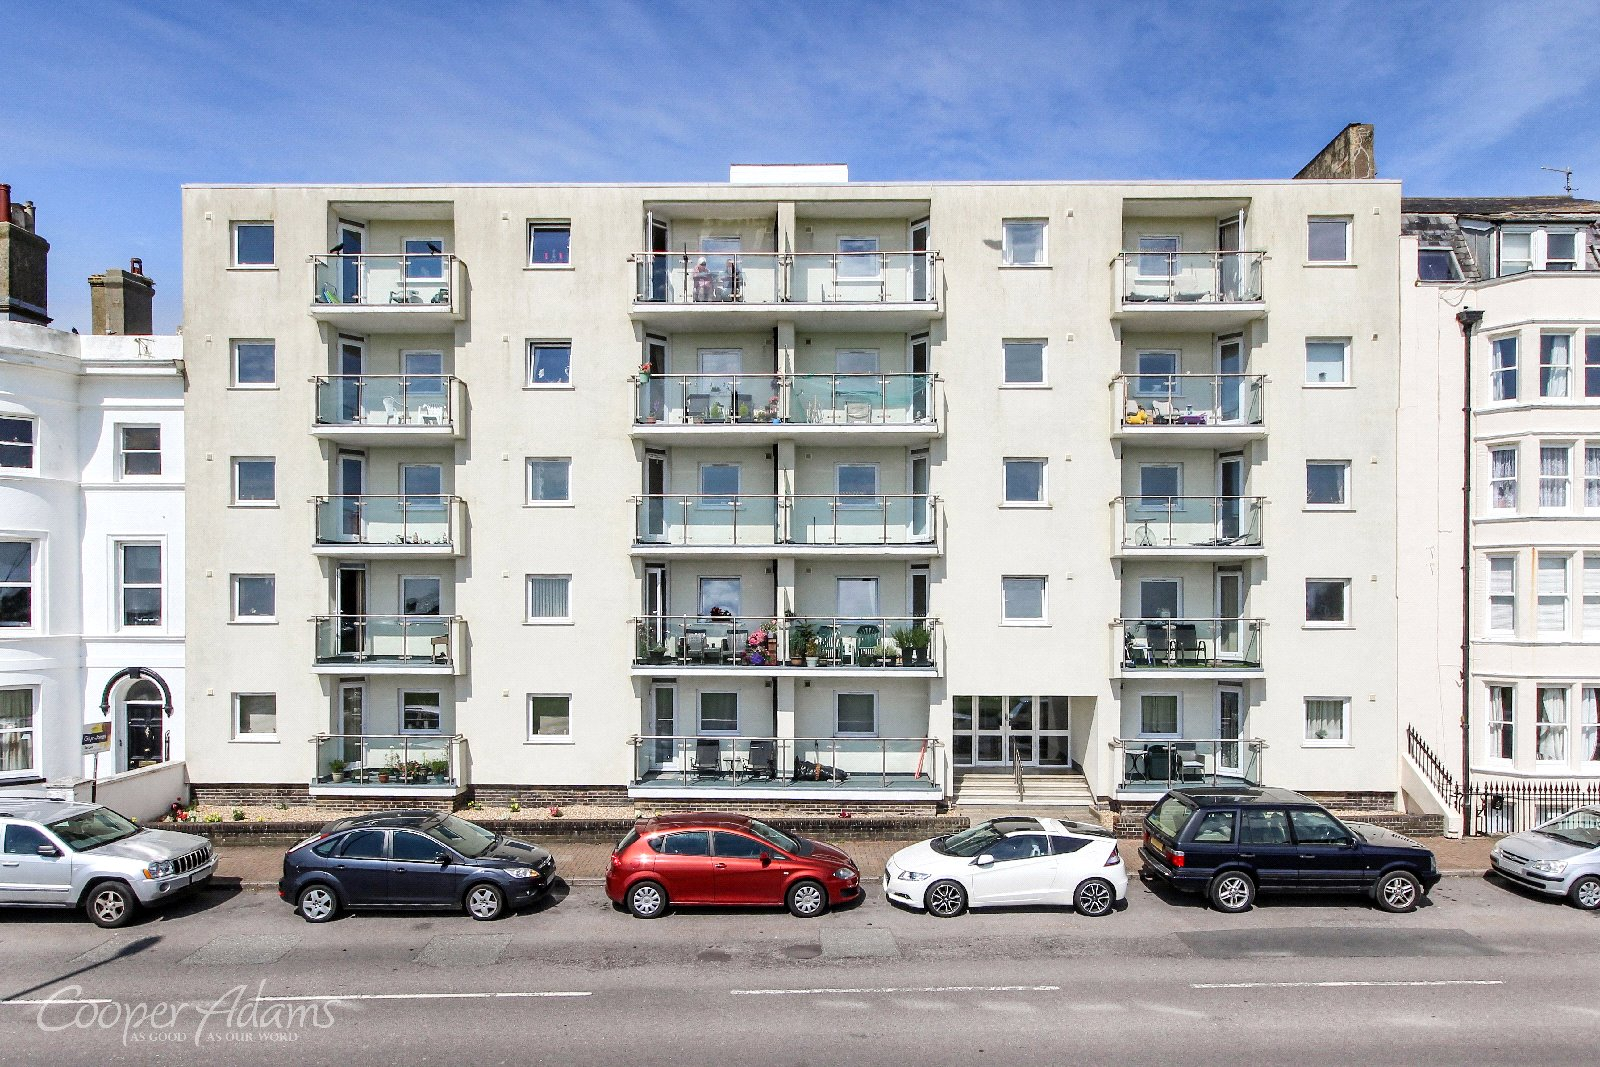 1 bed apartment for sale in Southlands Court, South Terrace, Littlehampton, BN17